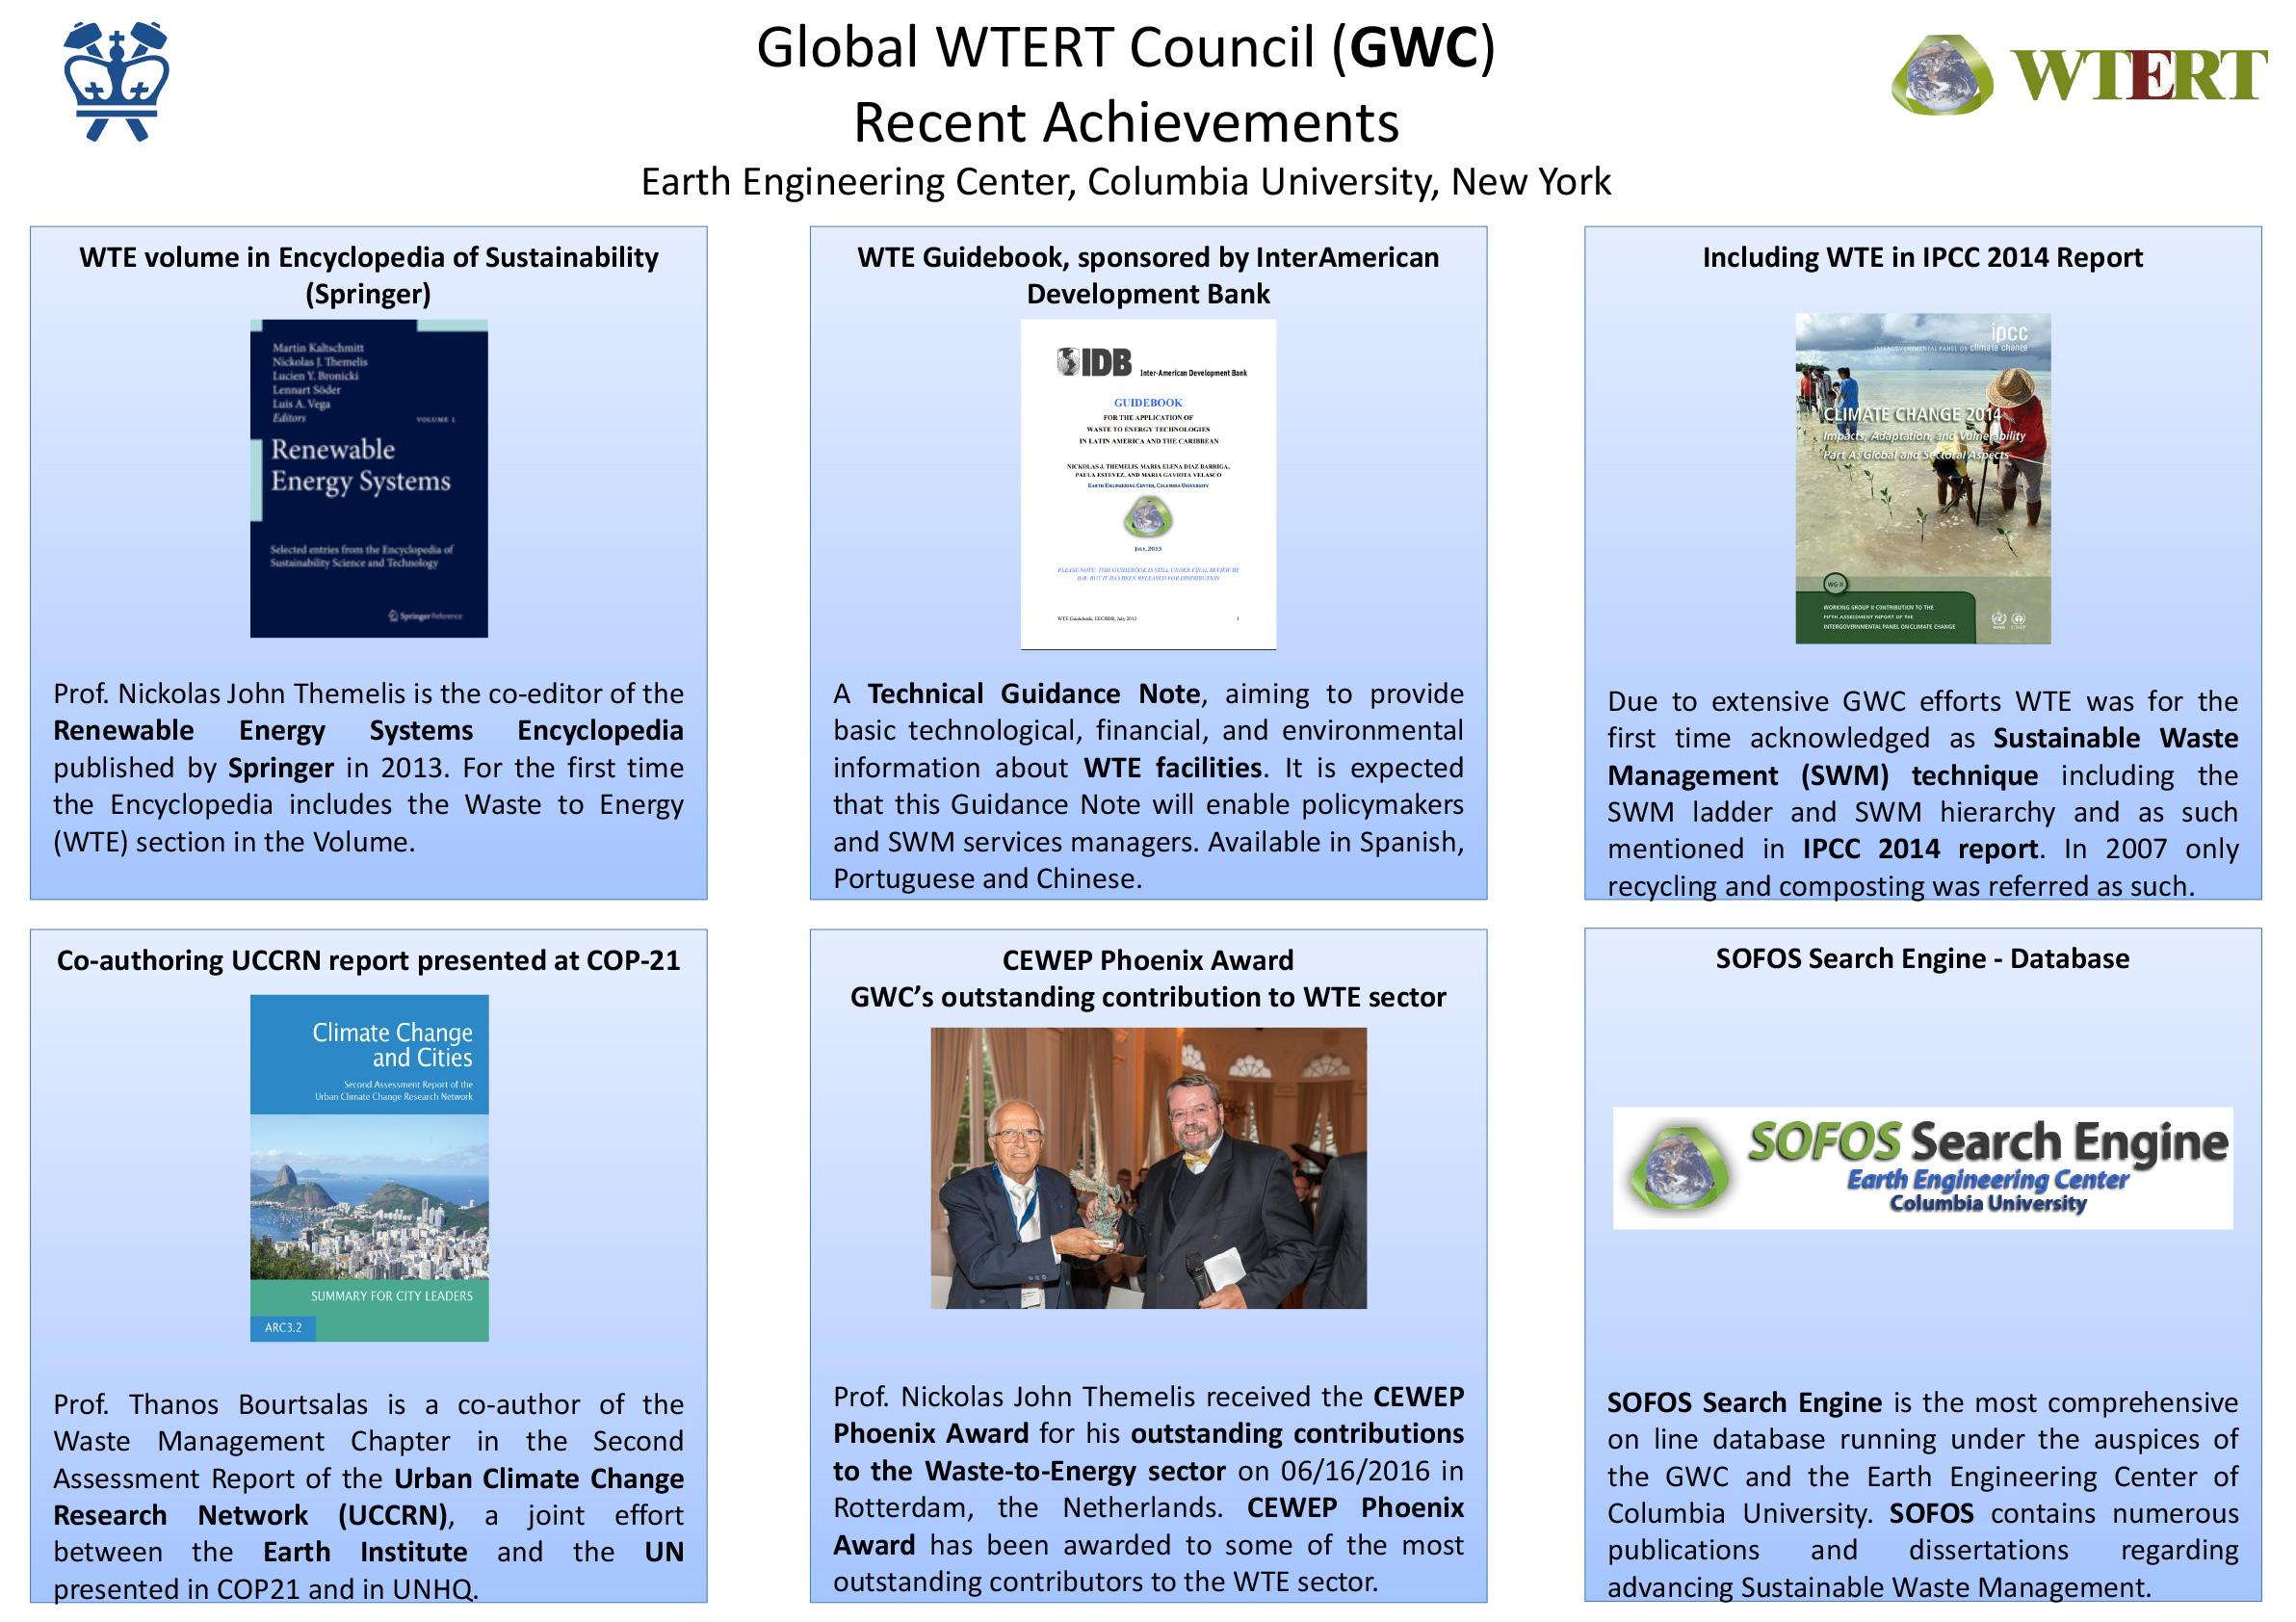 Global WTERT Council (GWC) Recent Achievements